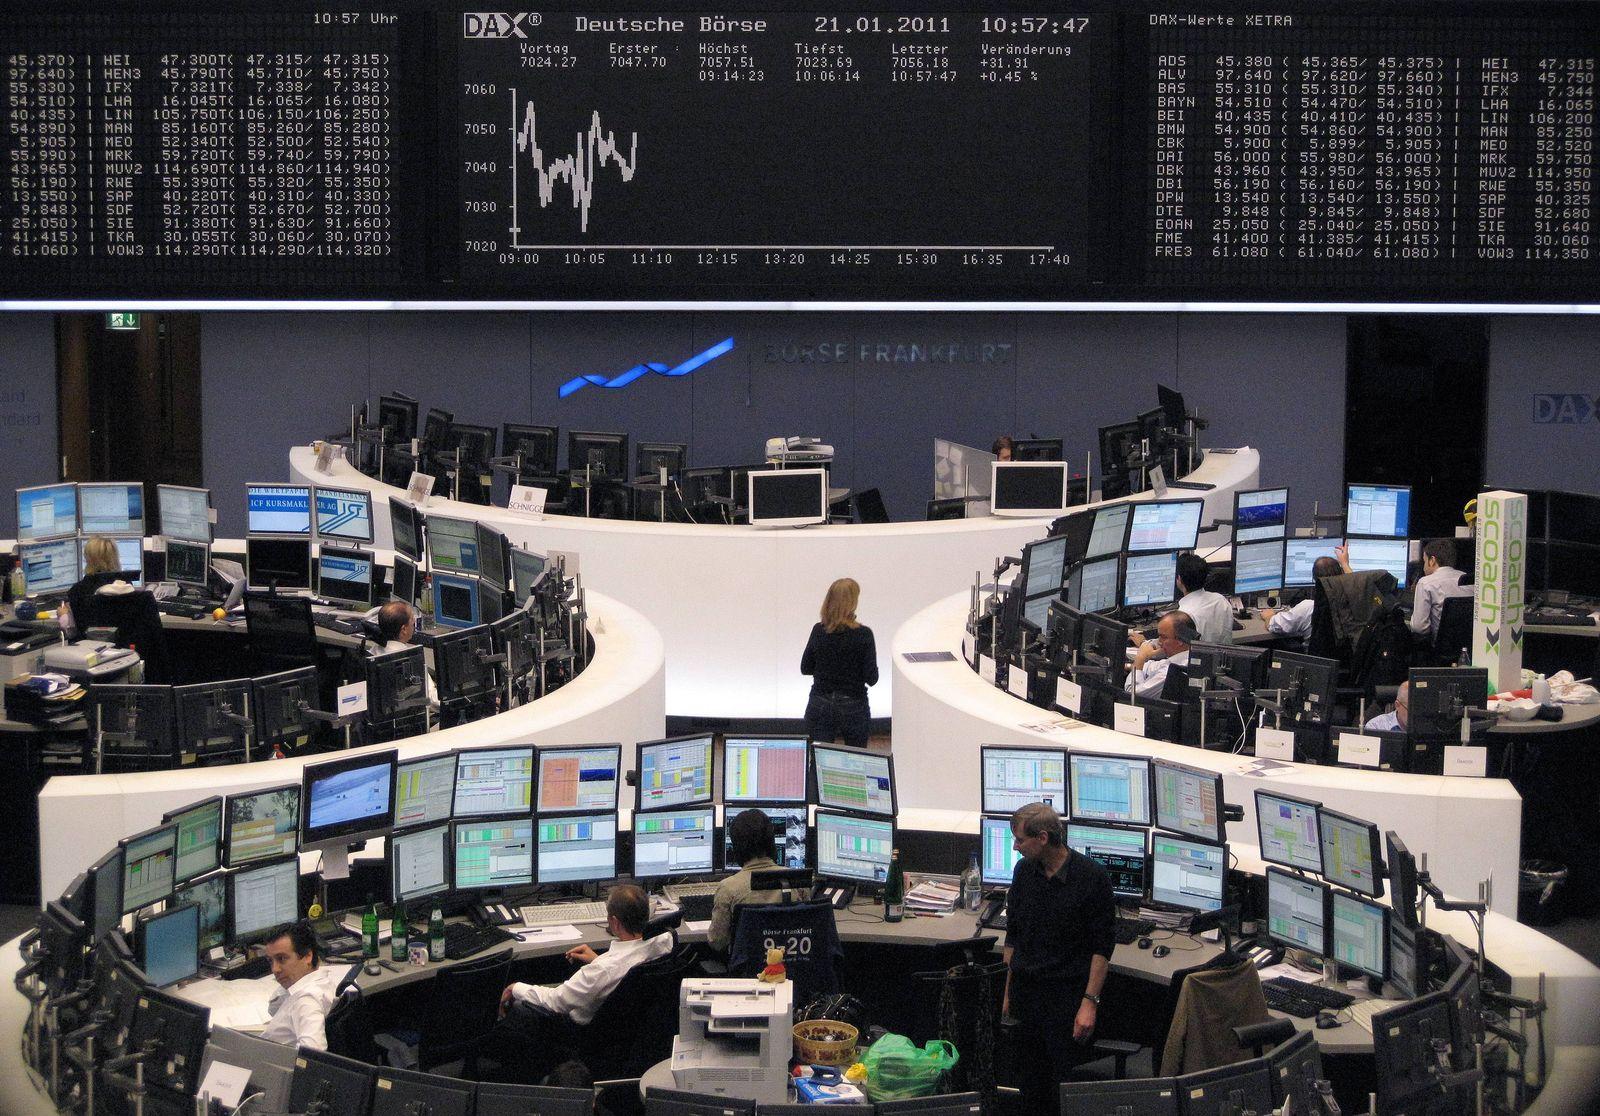 Börse Frankurt/ Händler